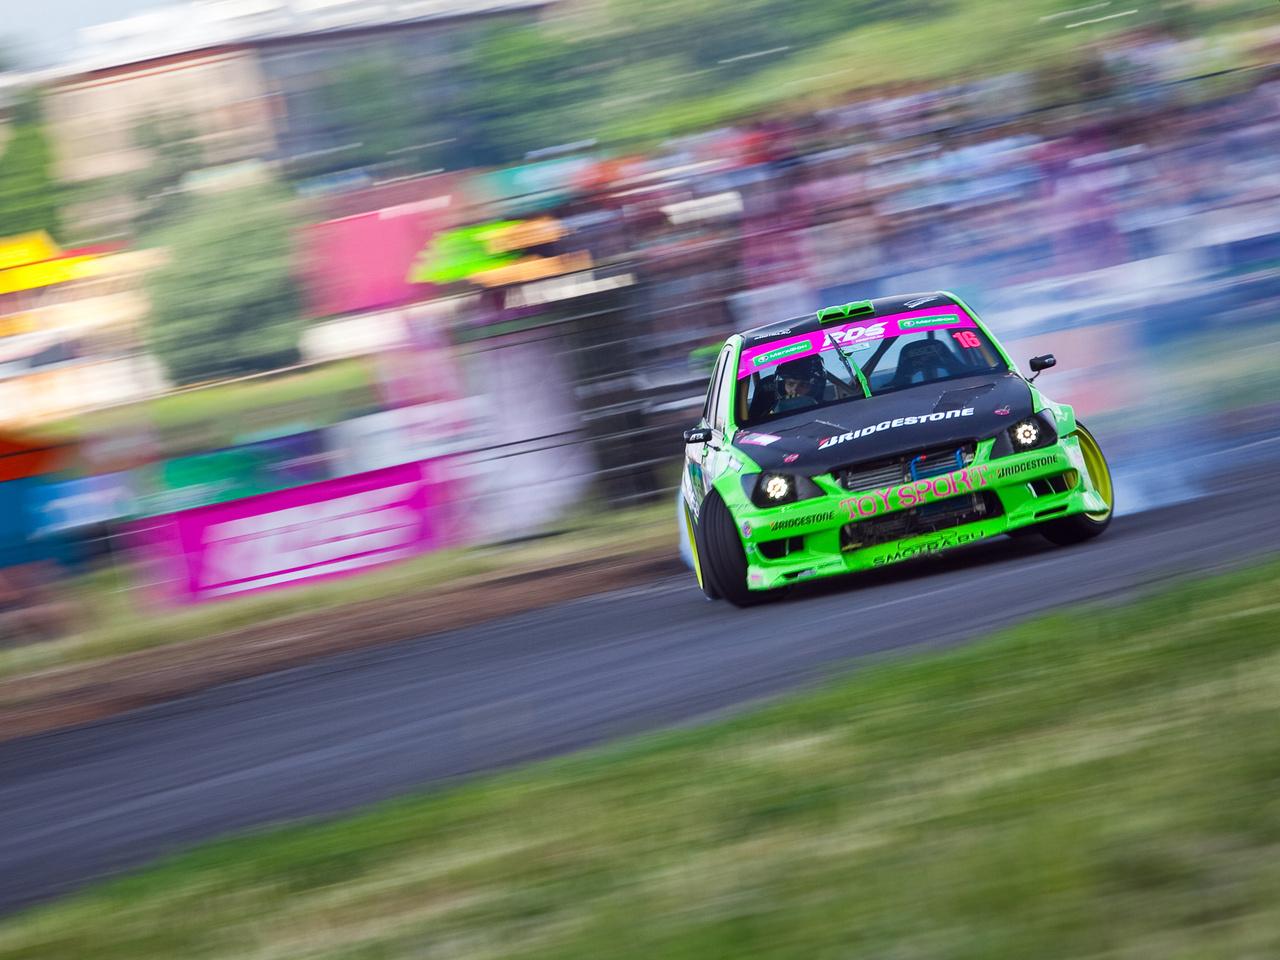 altezza, tuning, Toyota, drift, rds, formula drift